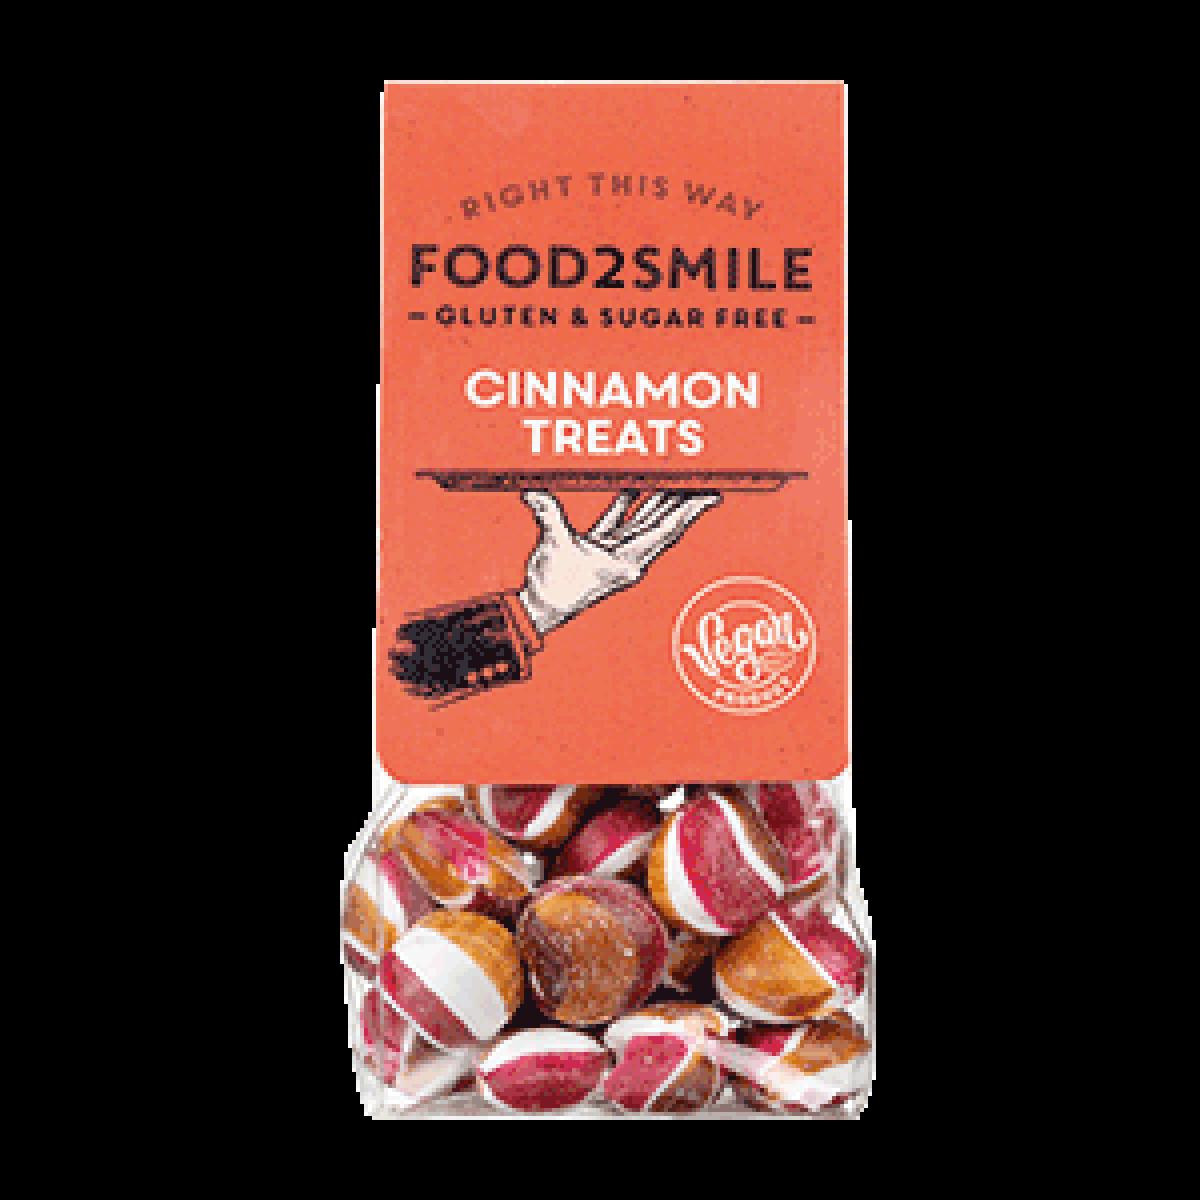 Cinnamon Treats